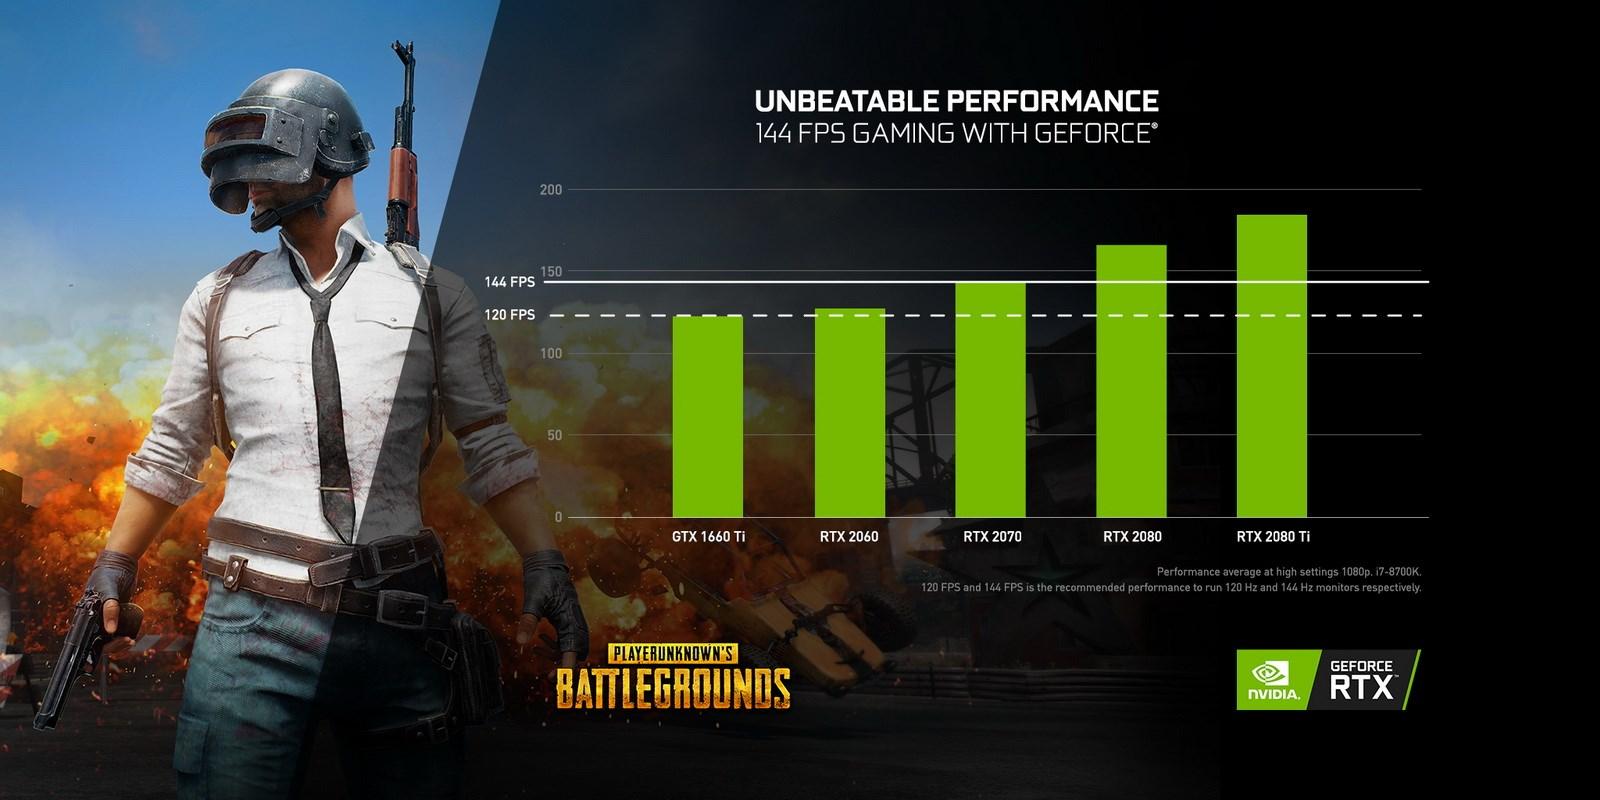 PUBG GeForce GPUs performance